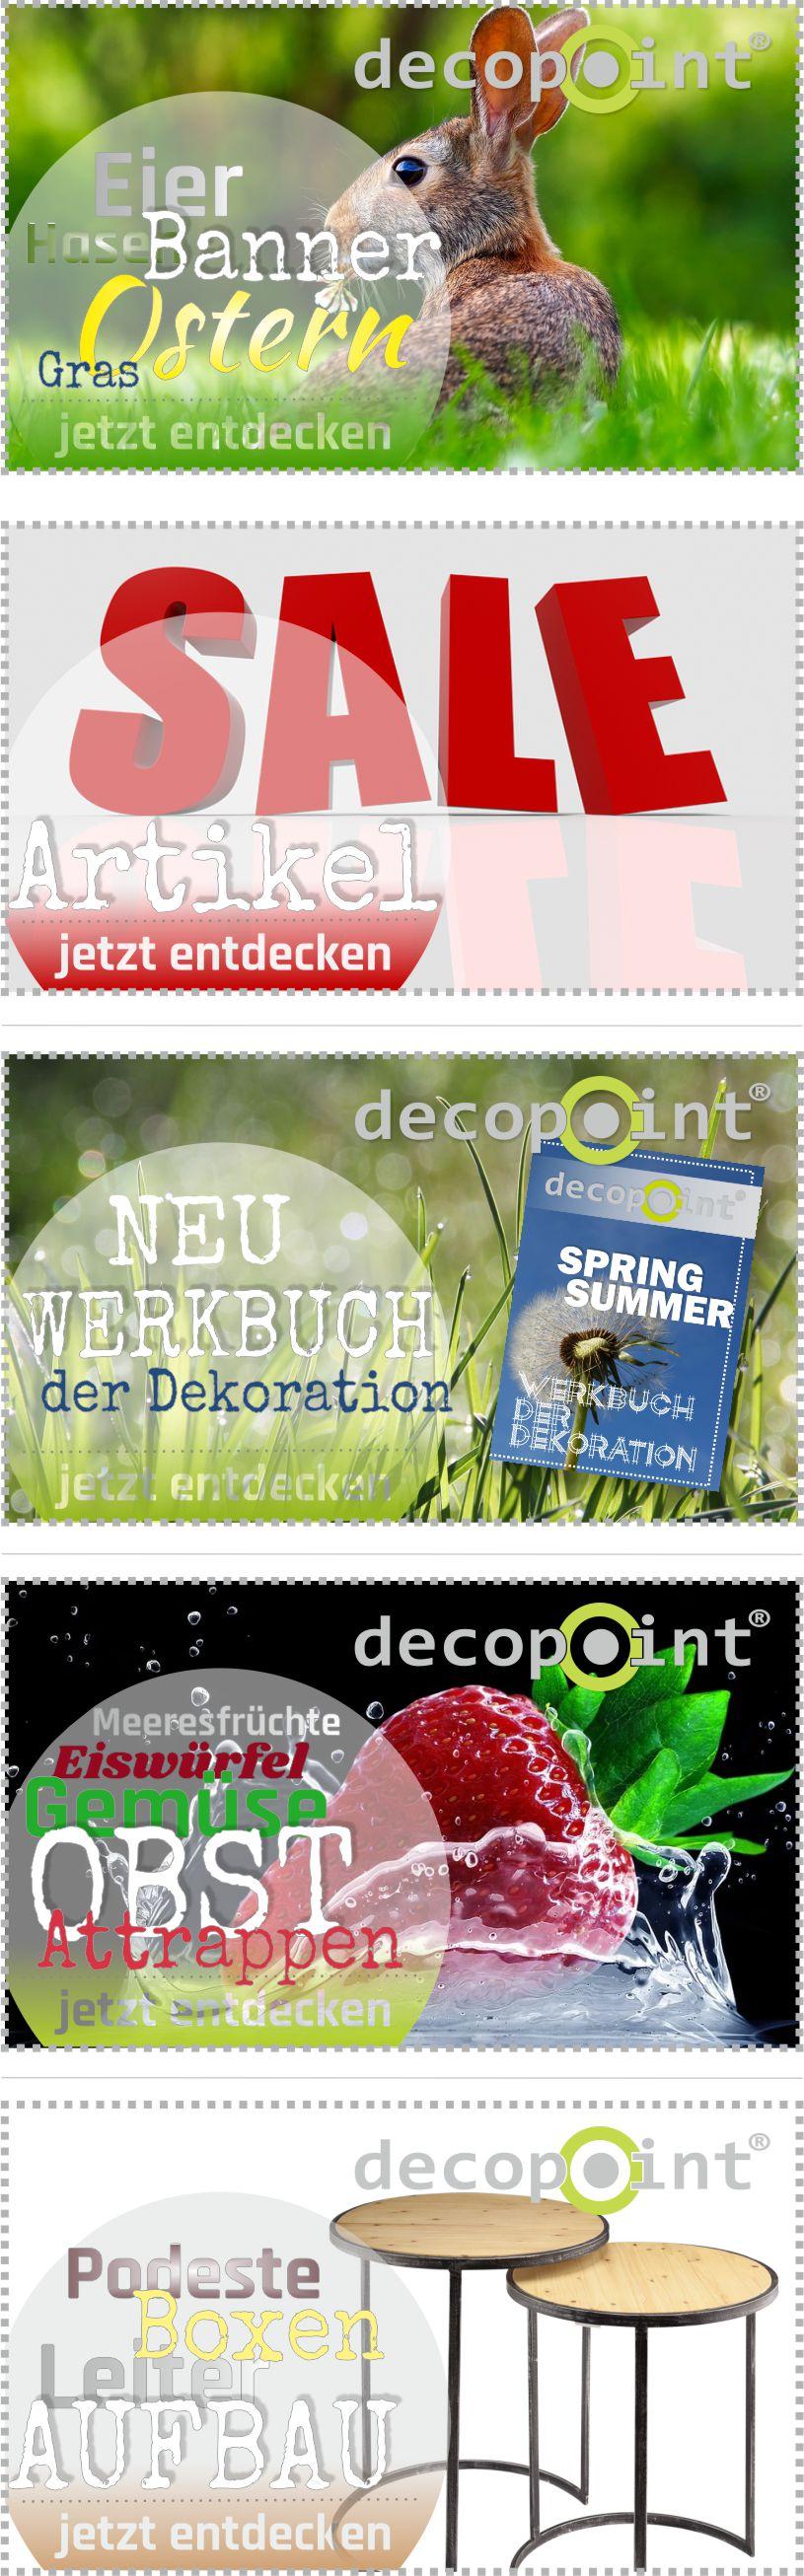 KW4 Ostern_Katalog_Sale_Attrapen_Aufbau